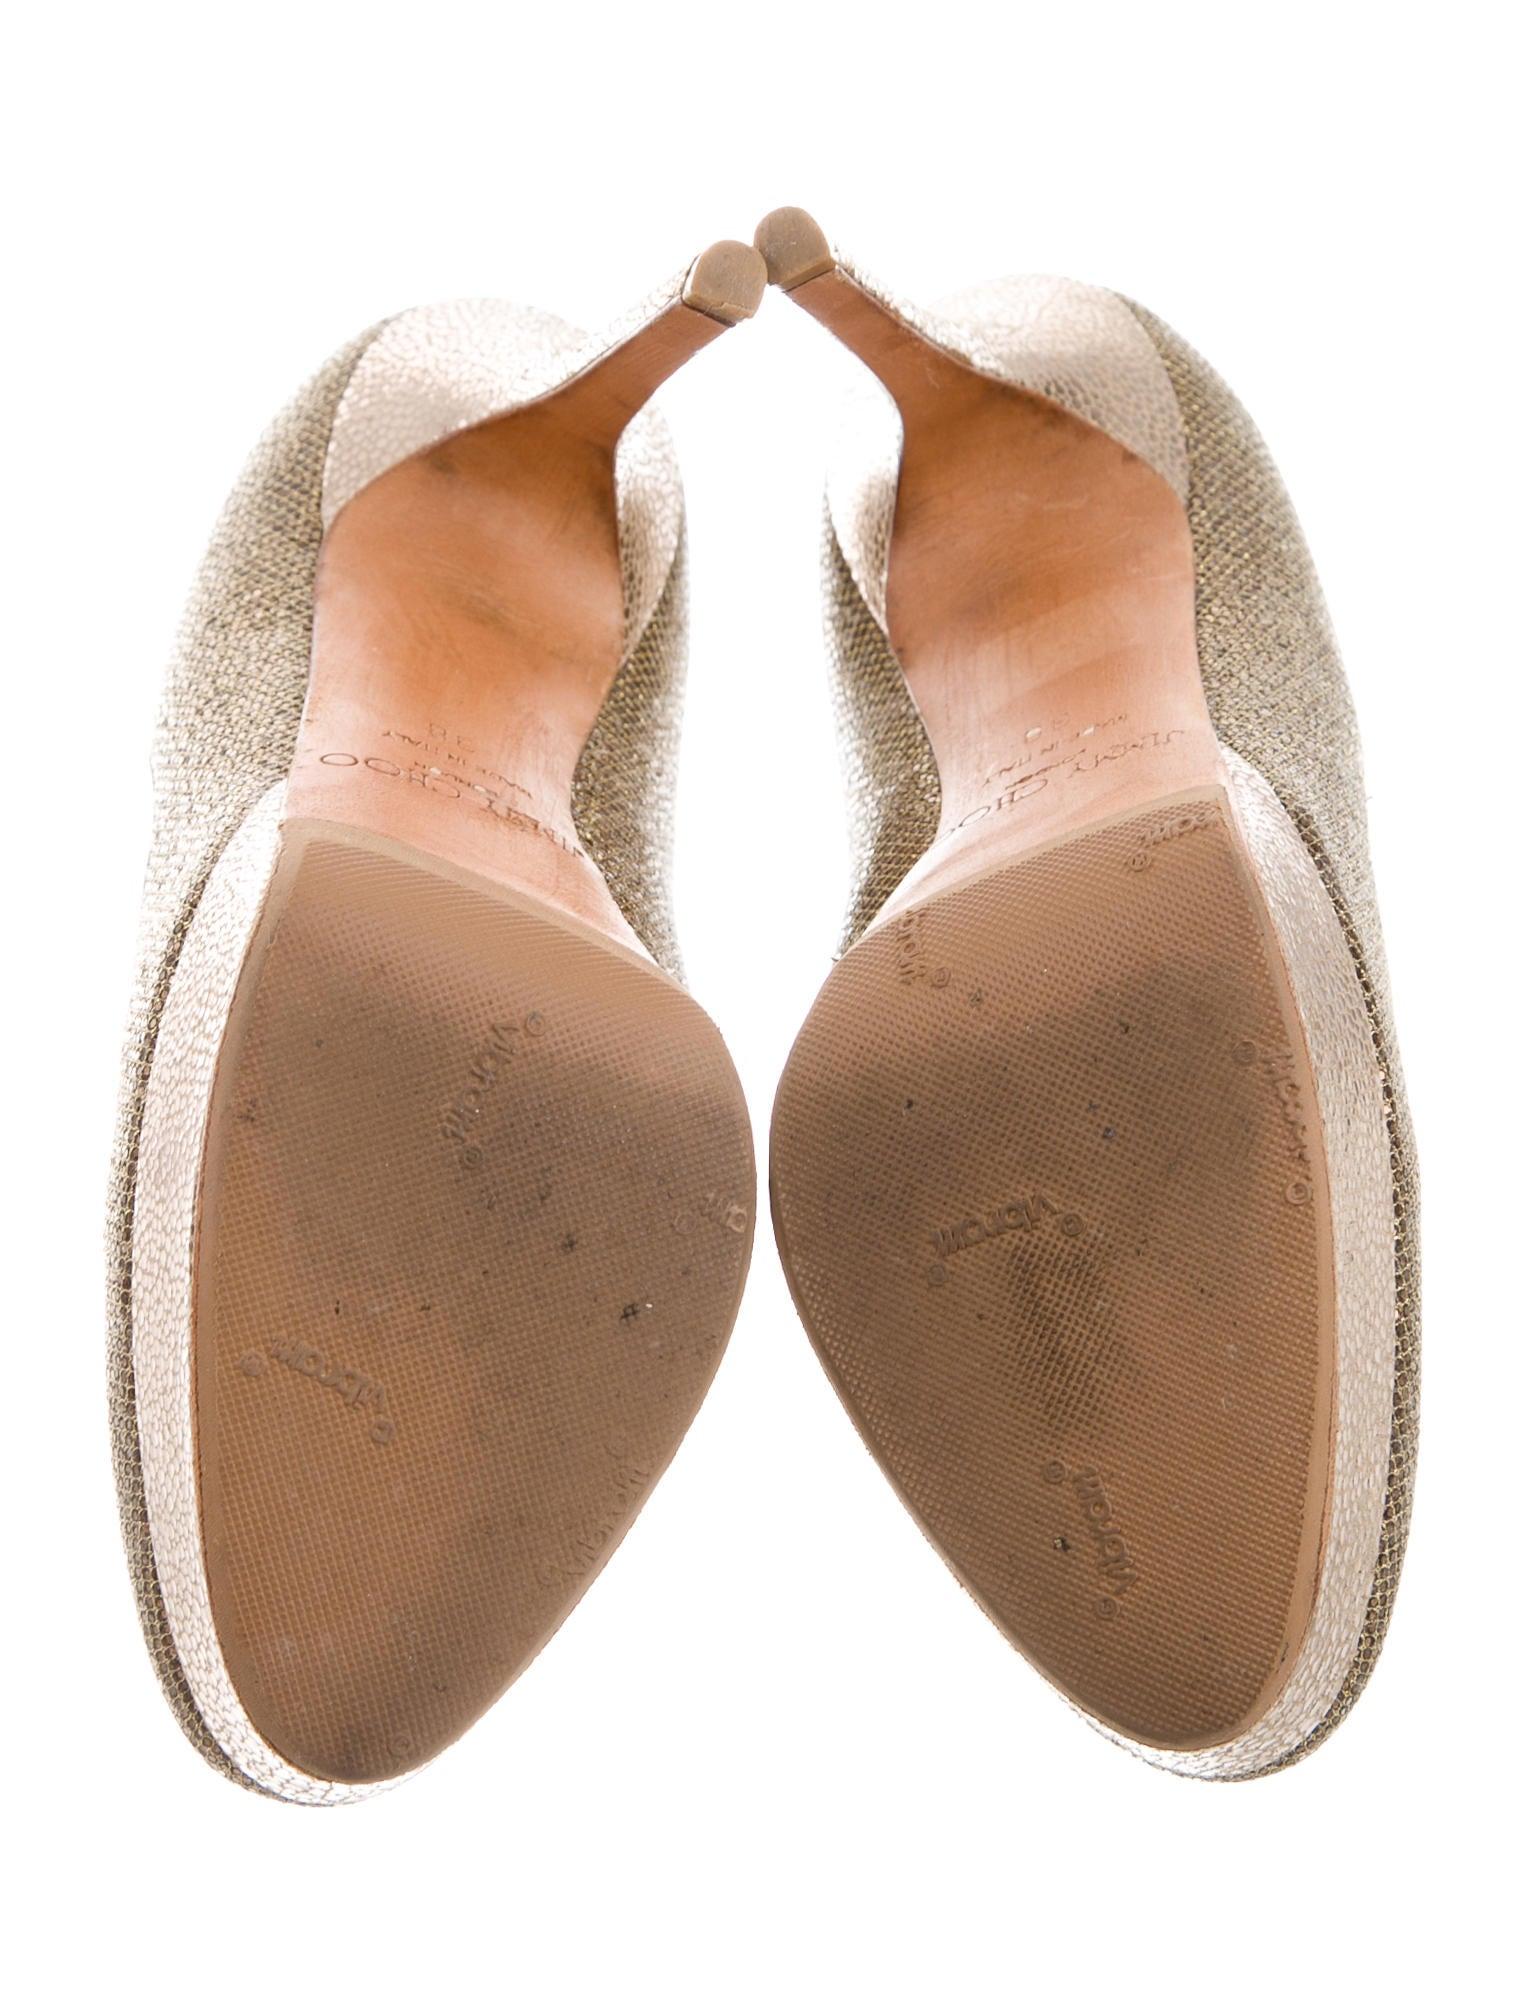 Jimmy Choo Women's Shoes | Nordstrom